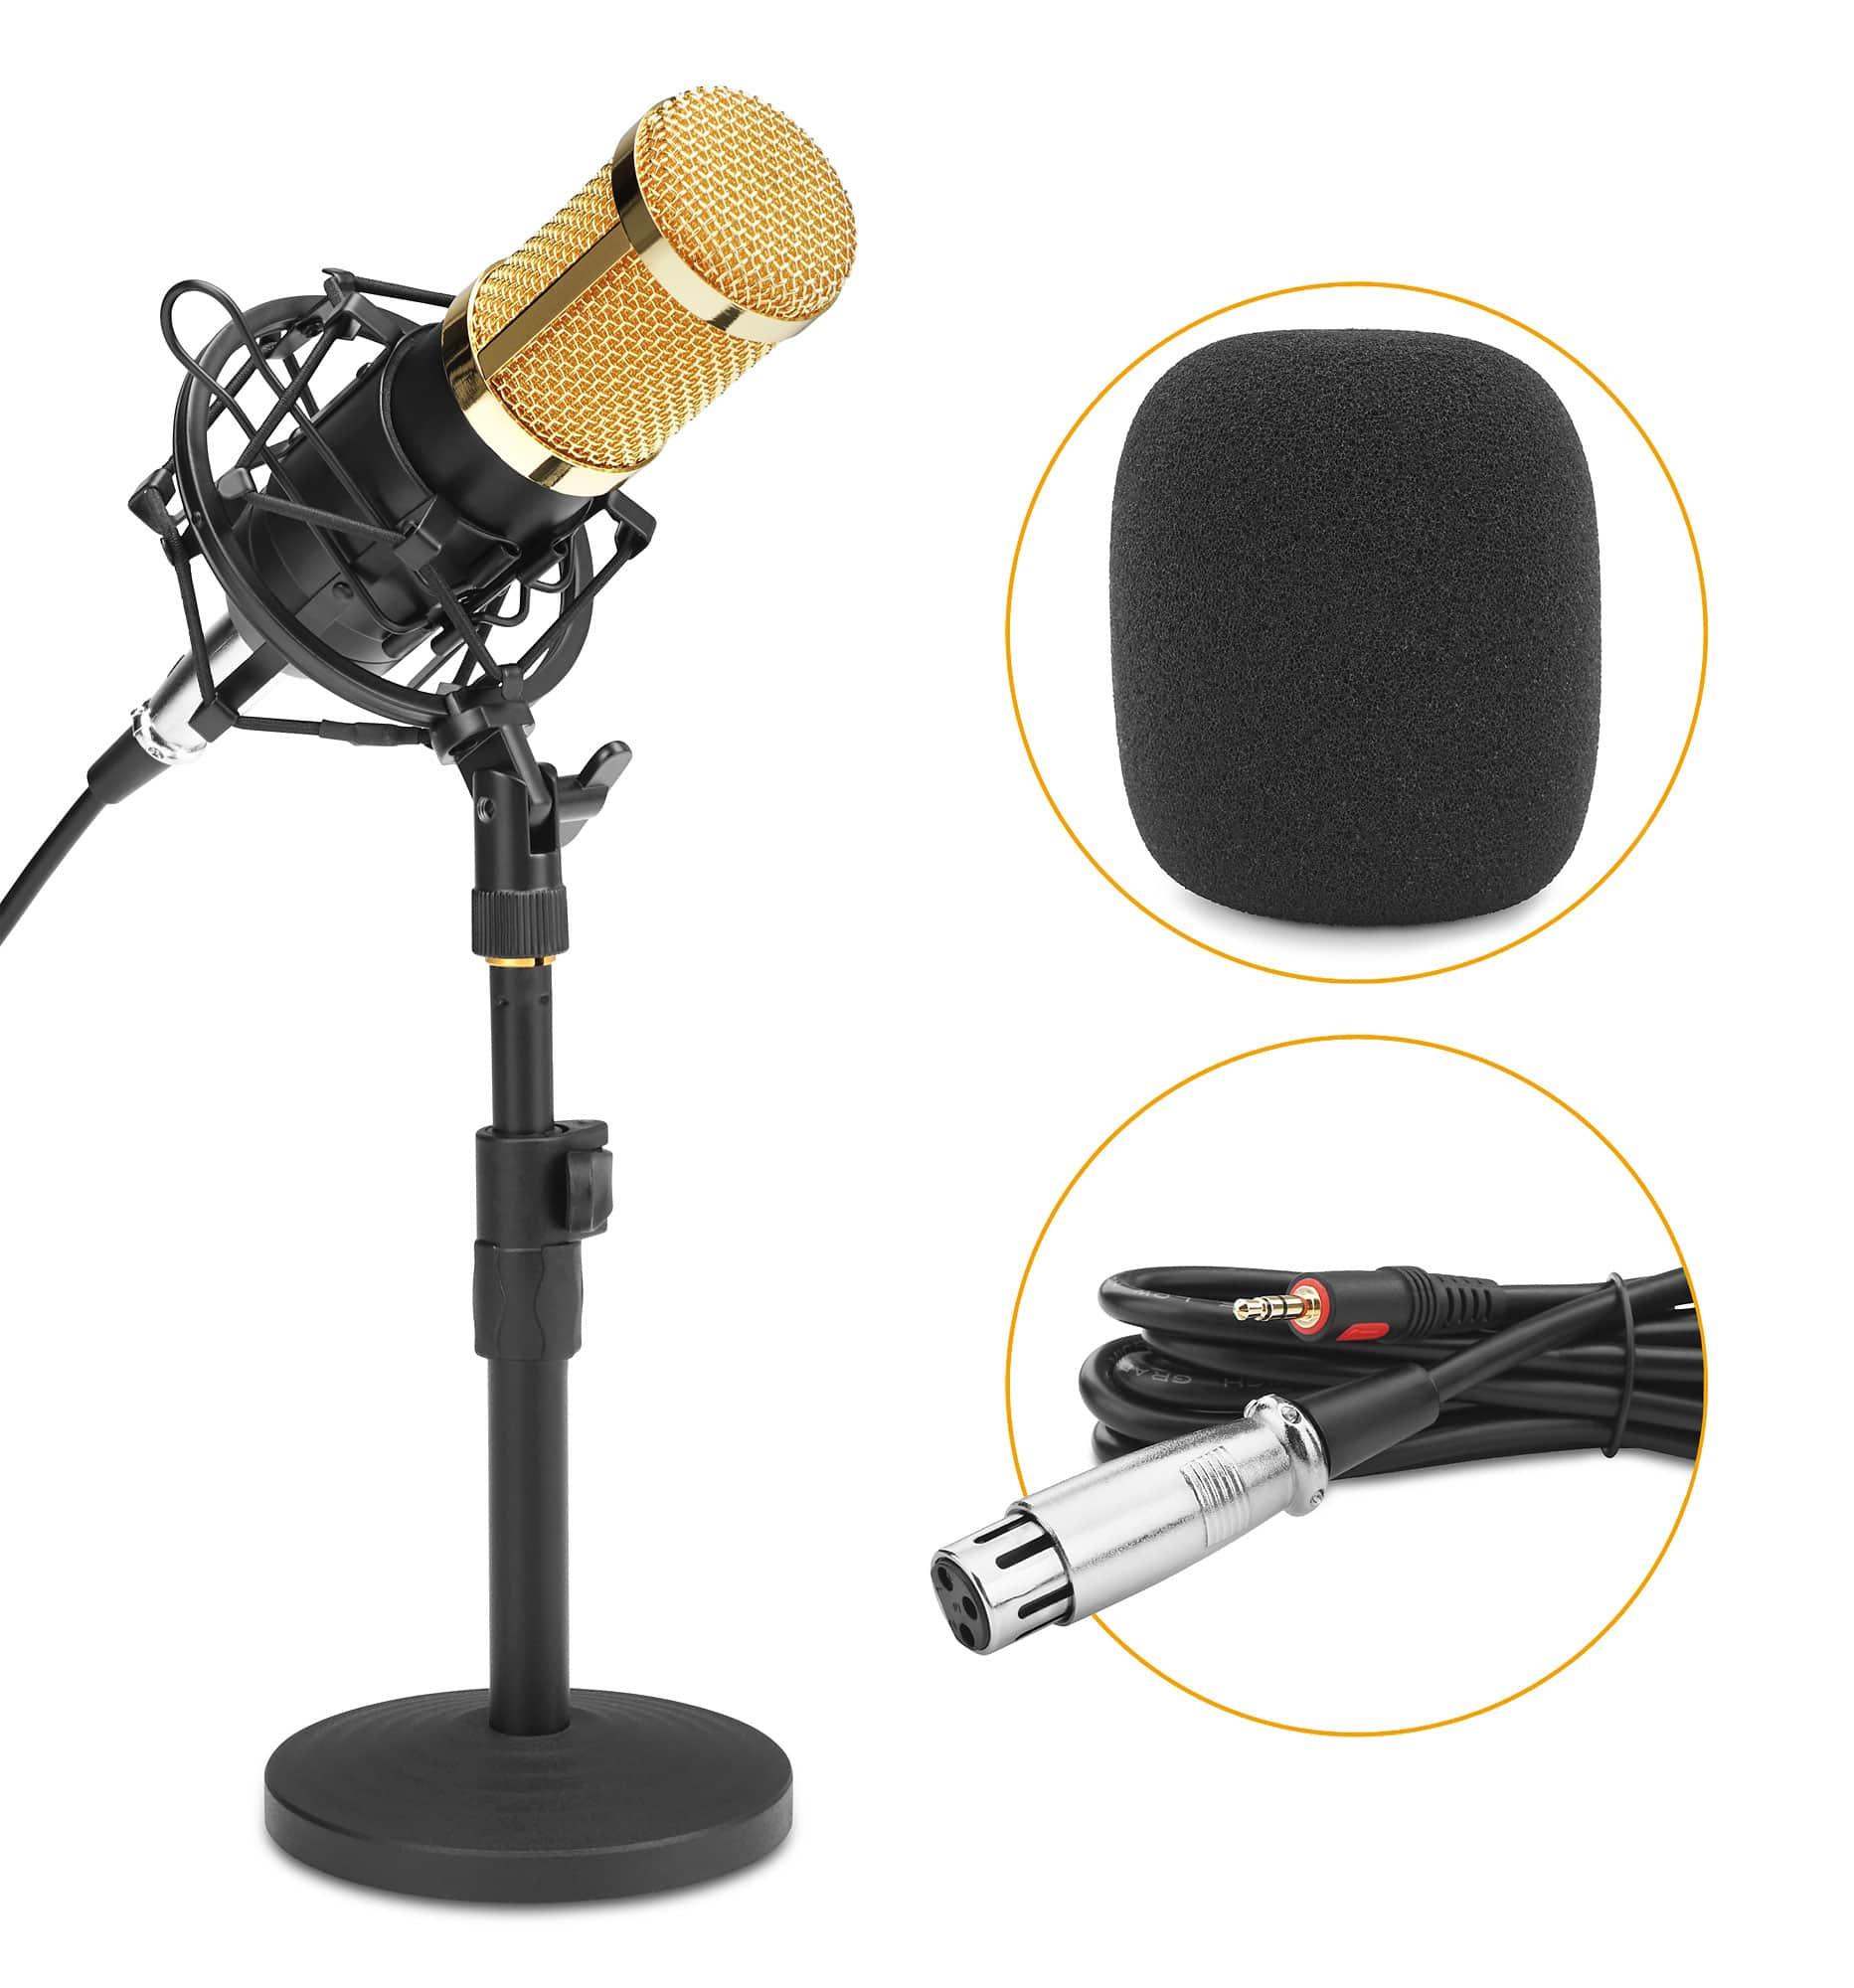 McGrey CM 80B Kondensator Podcast Set mit Mikrofon und Tischstativ